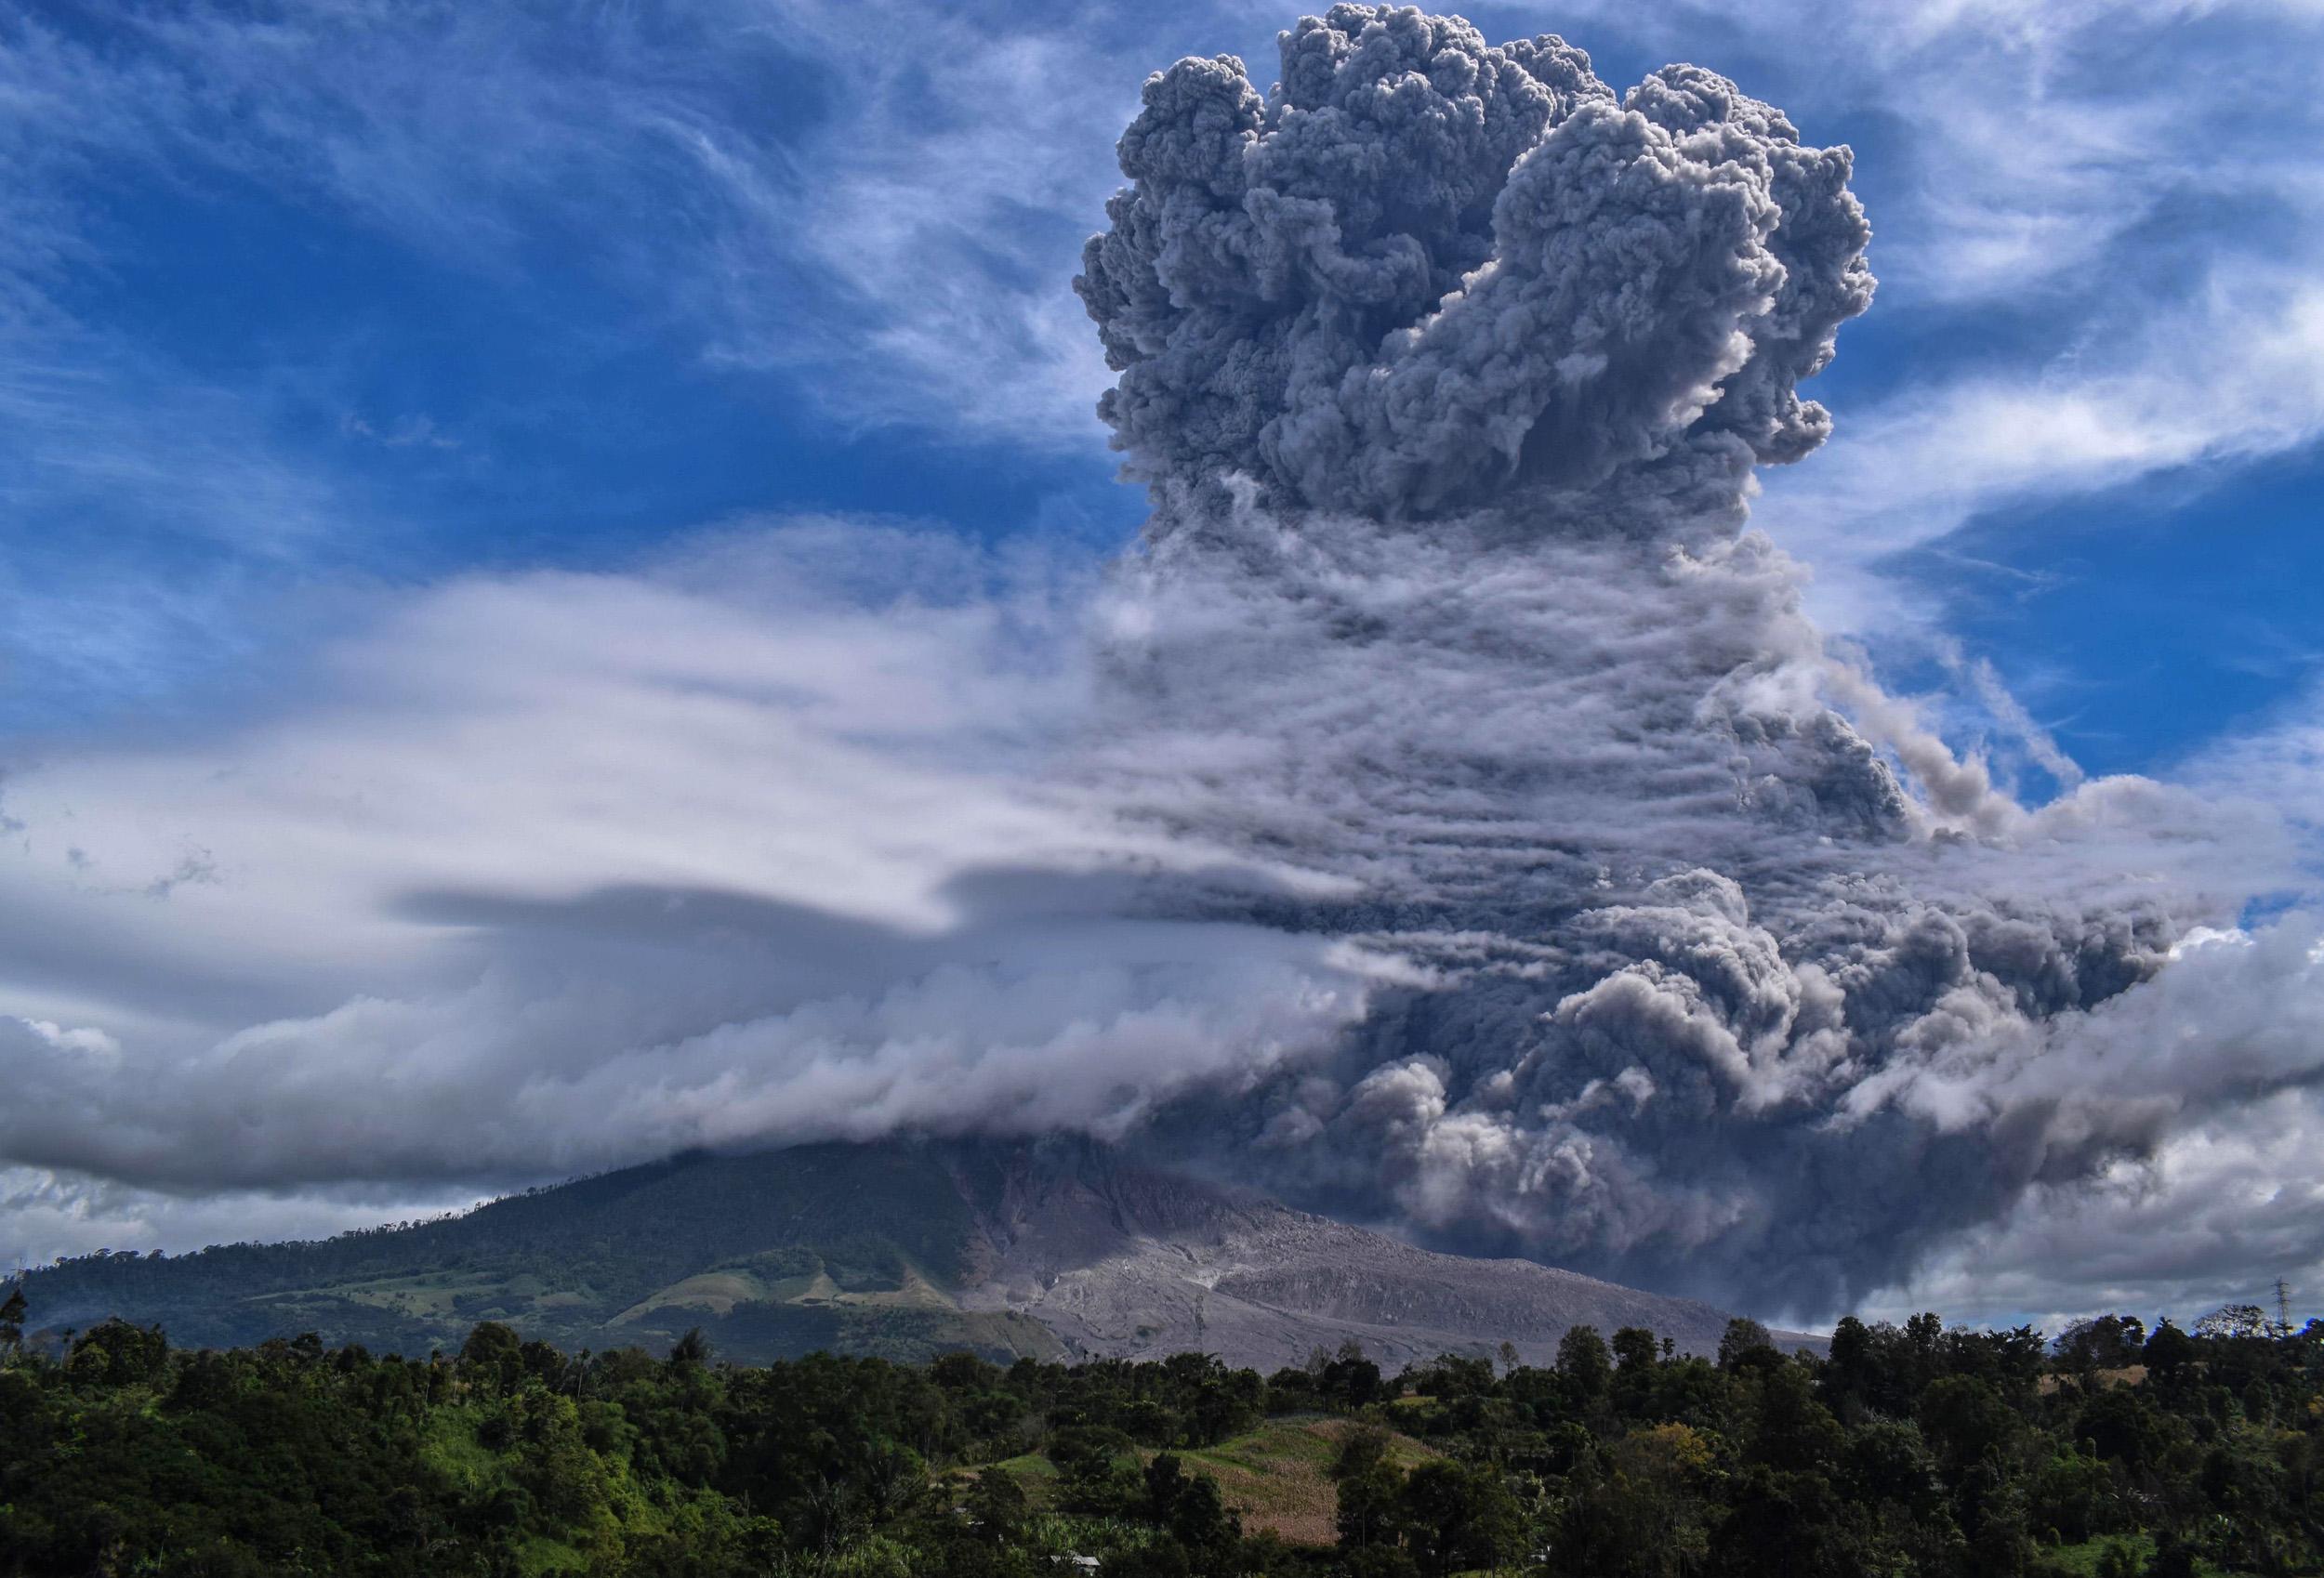 200810-sinabung-volcano-rockcms-mn-0910-